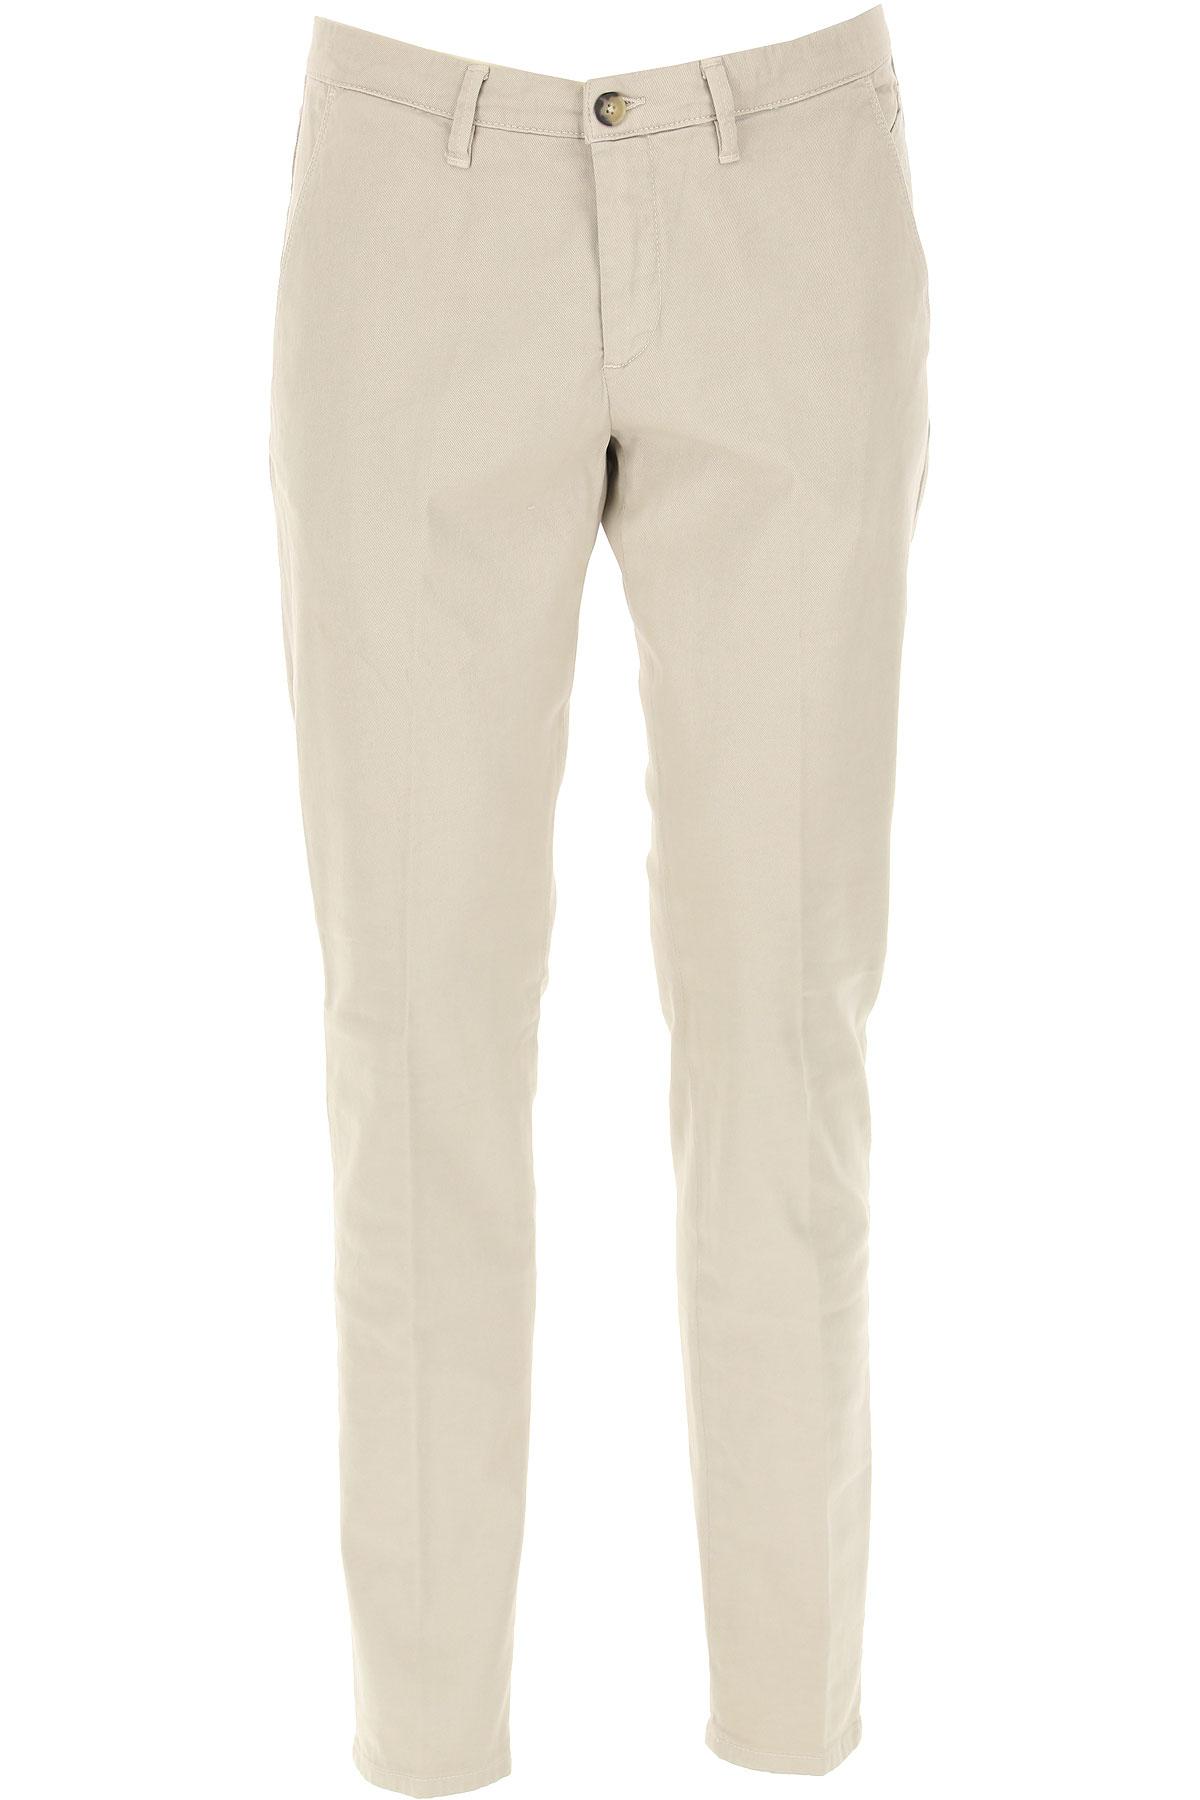 Jeckerson Pants for Men On Sale, Light Rope, Cotton, 2019, 30 31 32 33 34 35 36 38